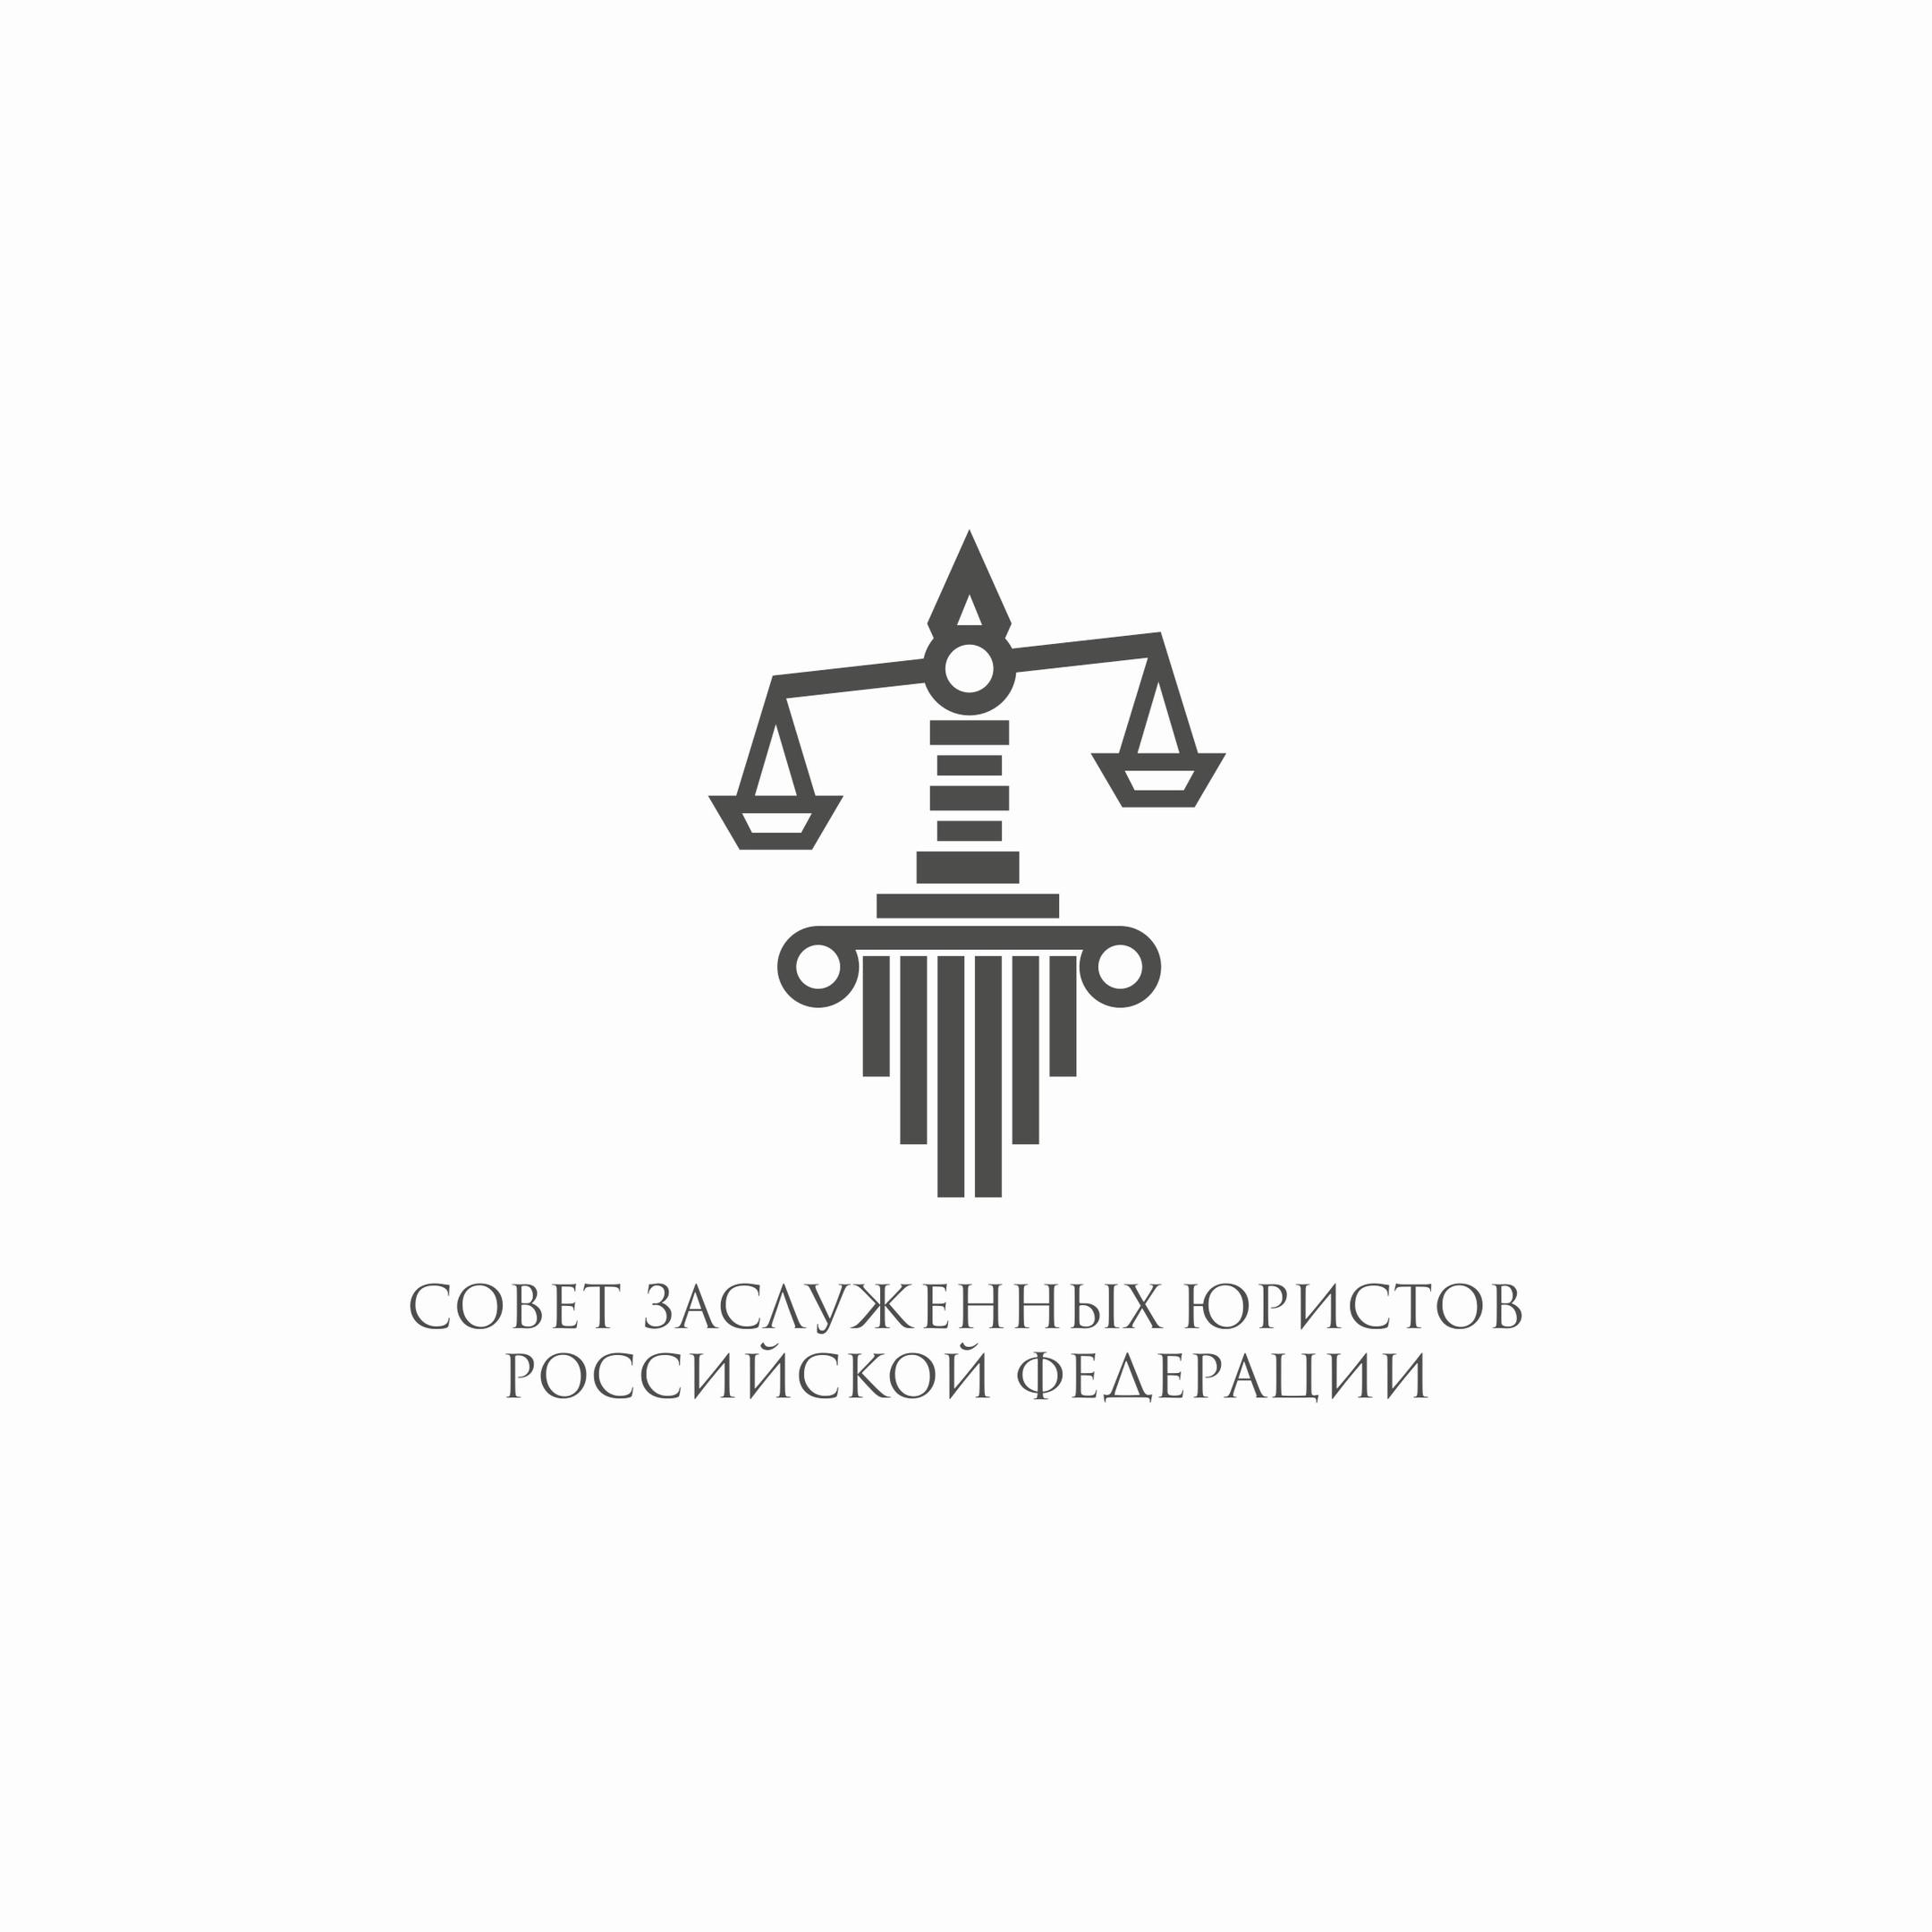 Разработка логотипа Совета (Клуба) заслуженных юристов Российской Федерации фото f_3055e46b3b802a55.jpg